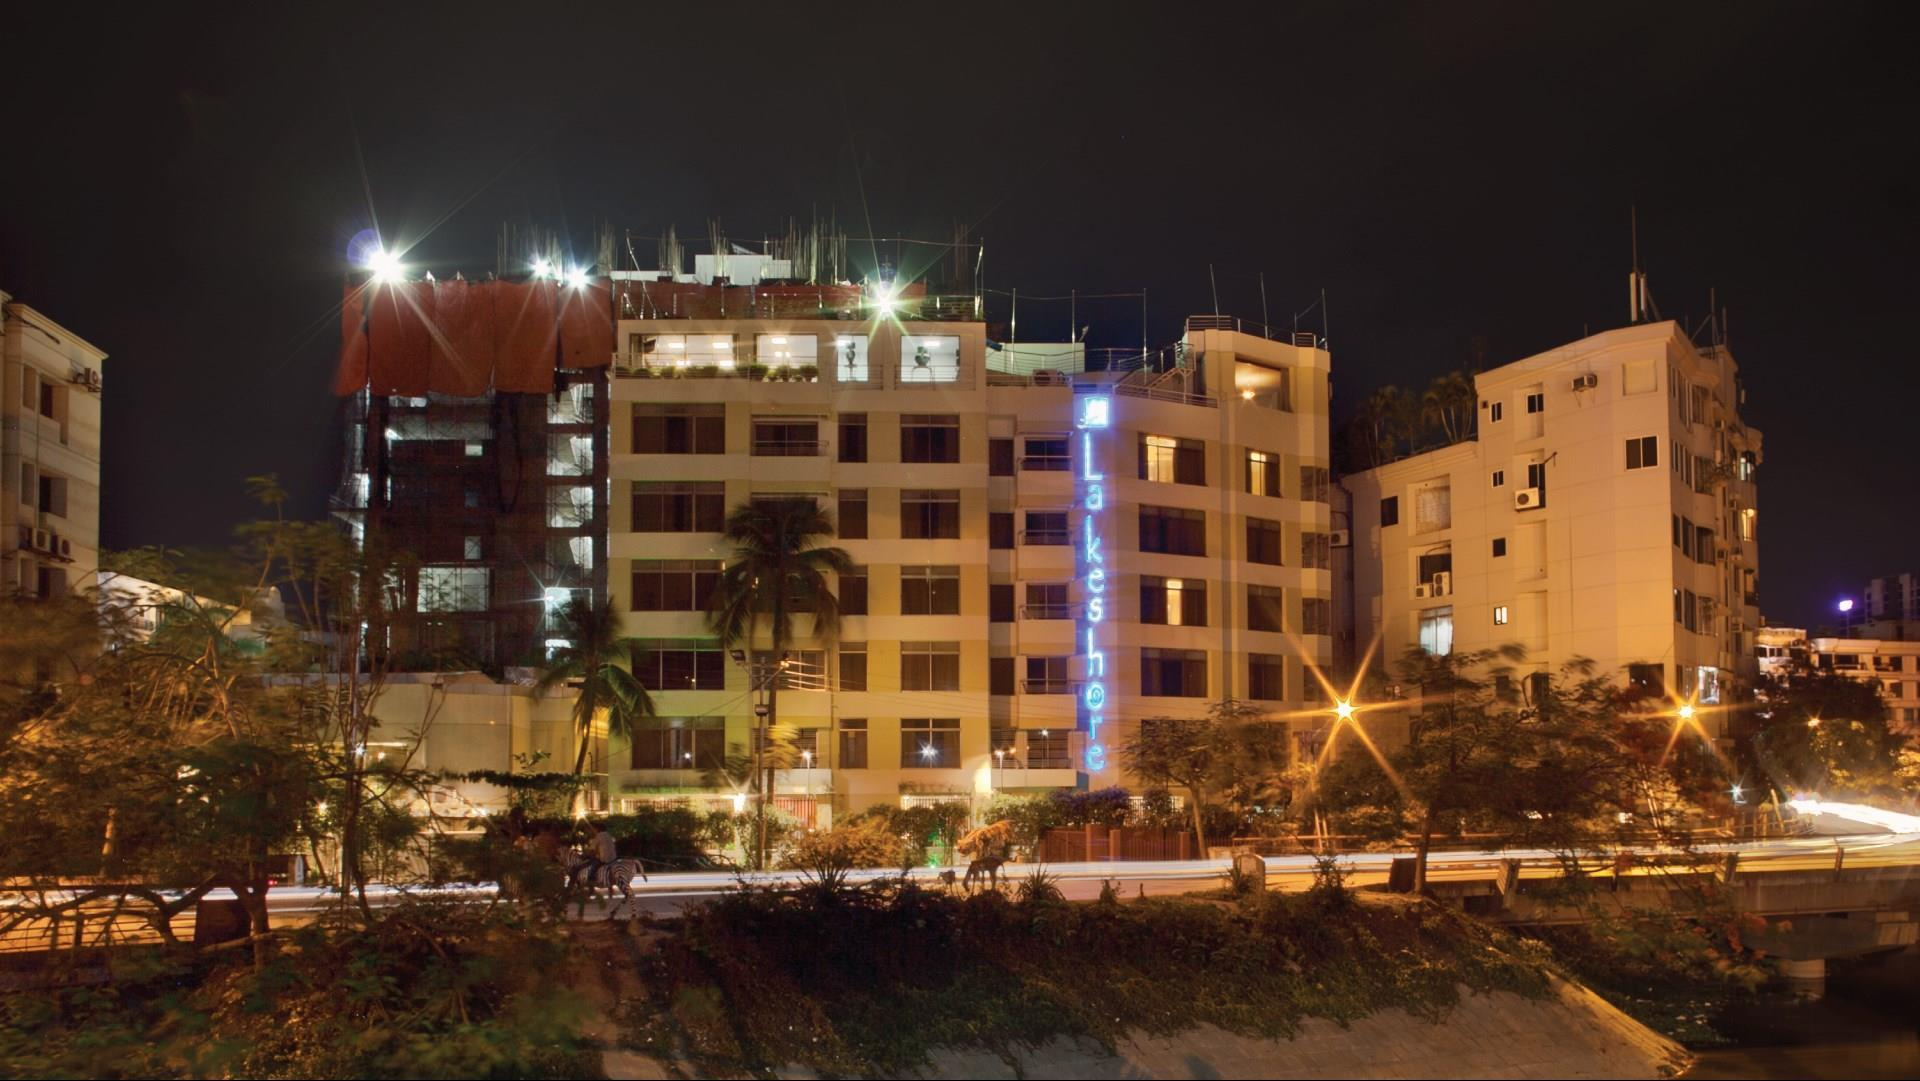 Meetings and events at Lakeshore Hotel, Dhaka, BD